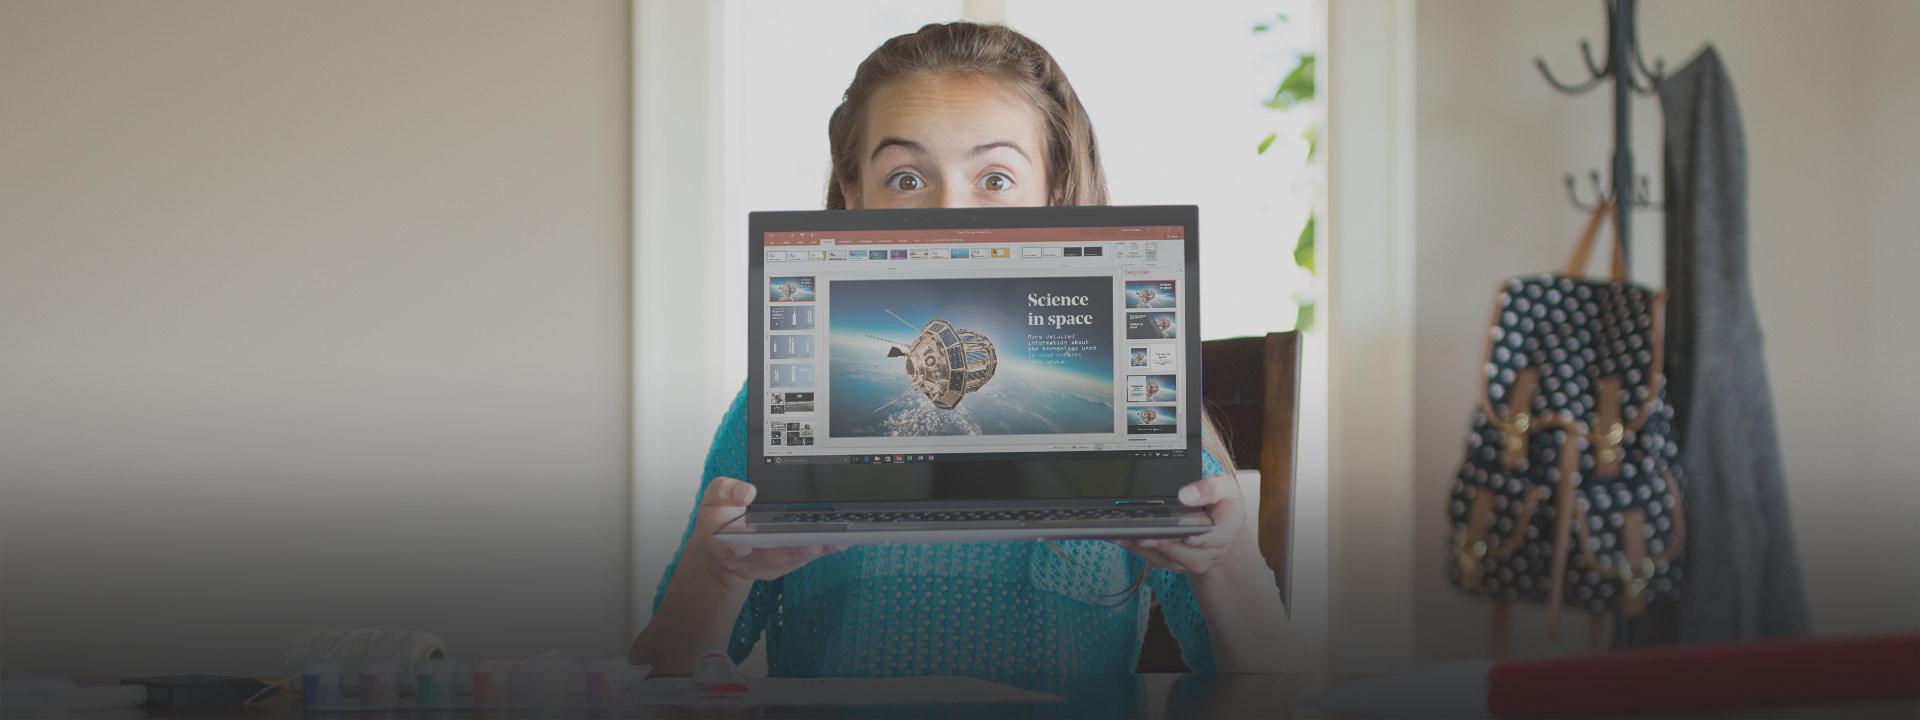 PC, selengkapnya tentang Office 365